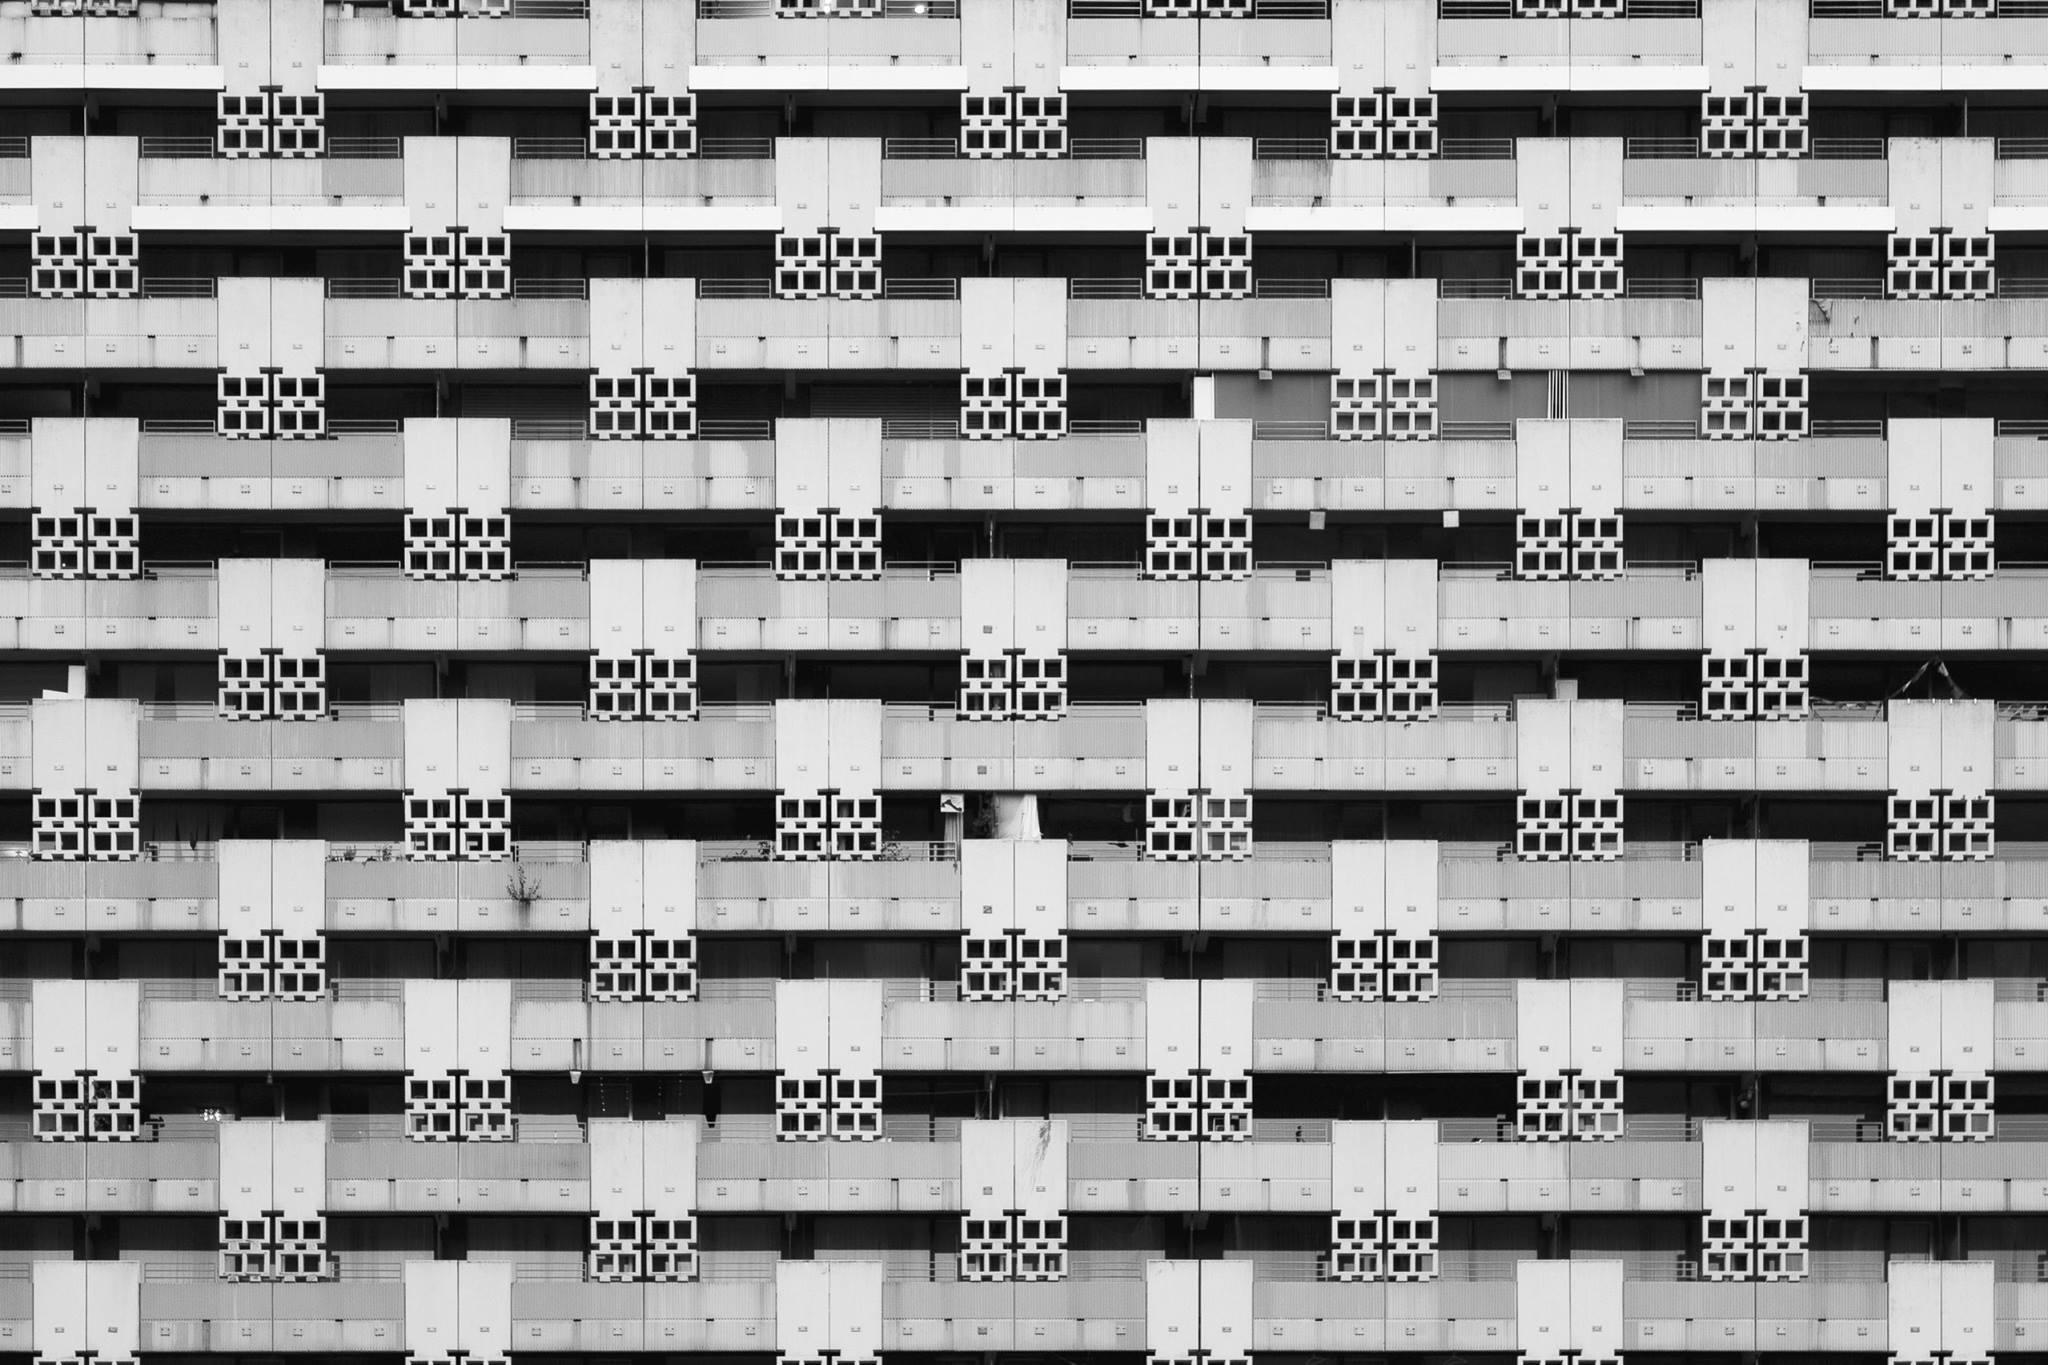 kevin-krautgartner-architecture-photography-12